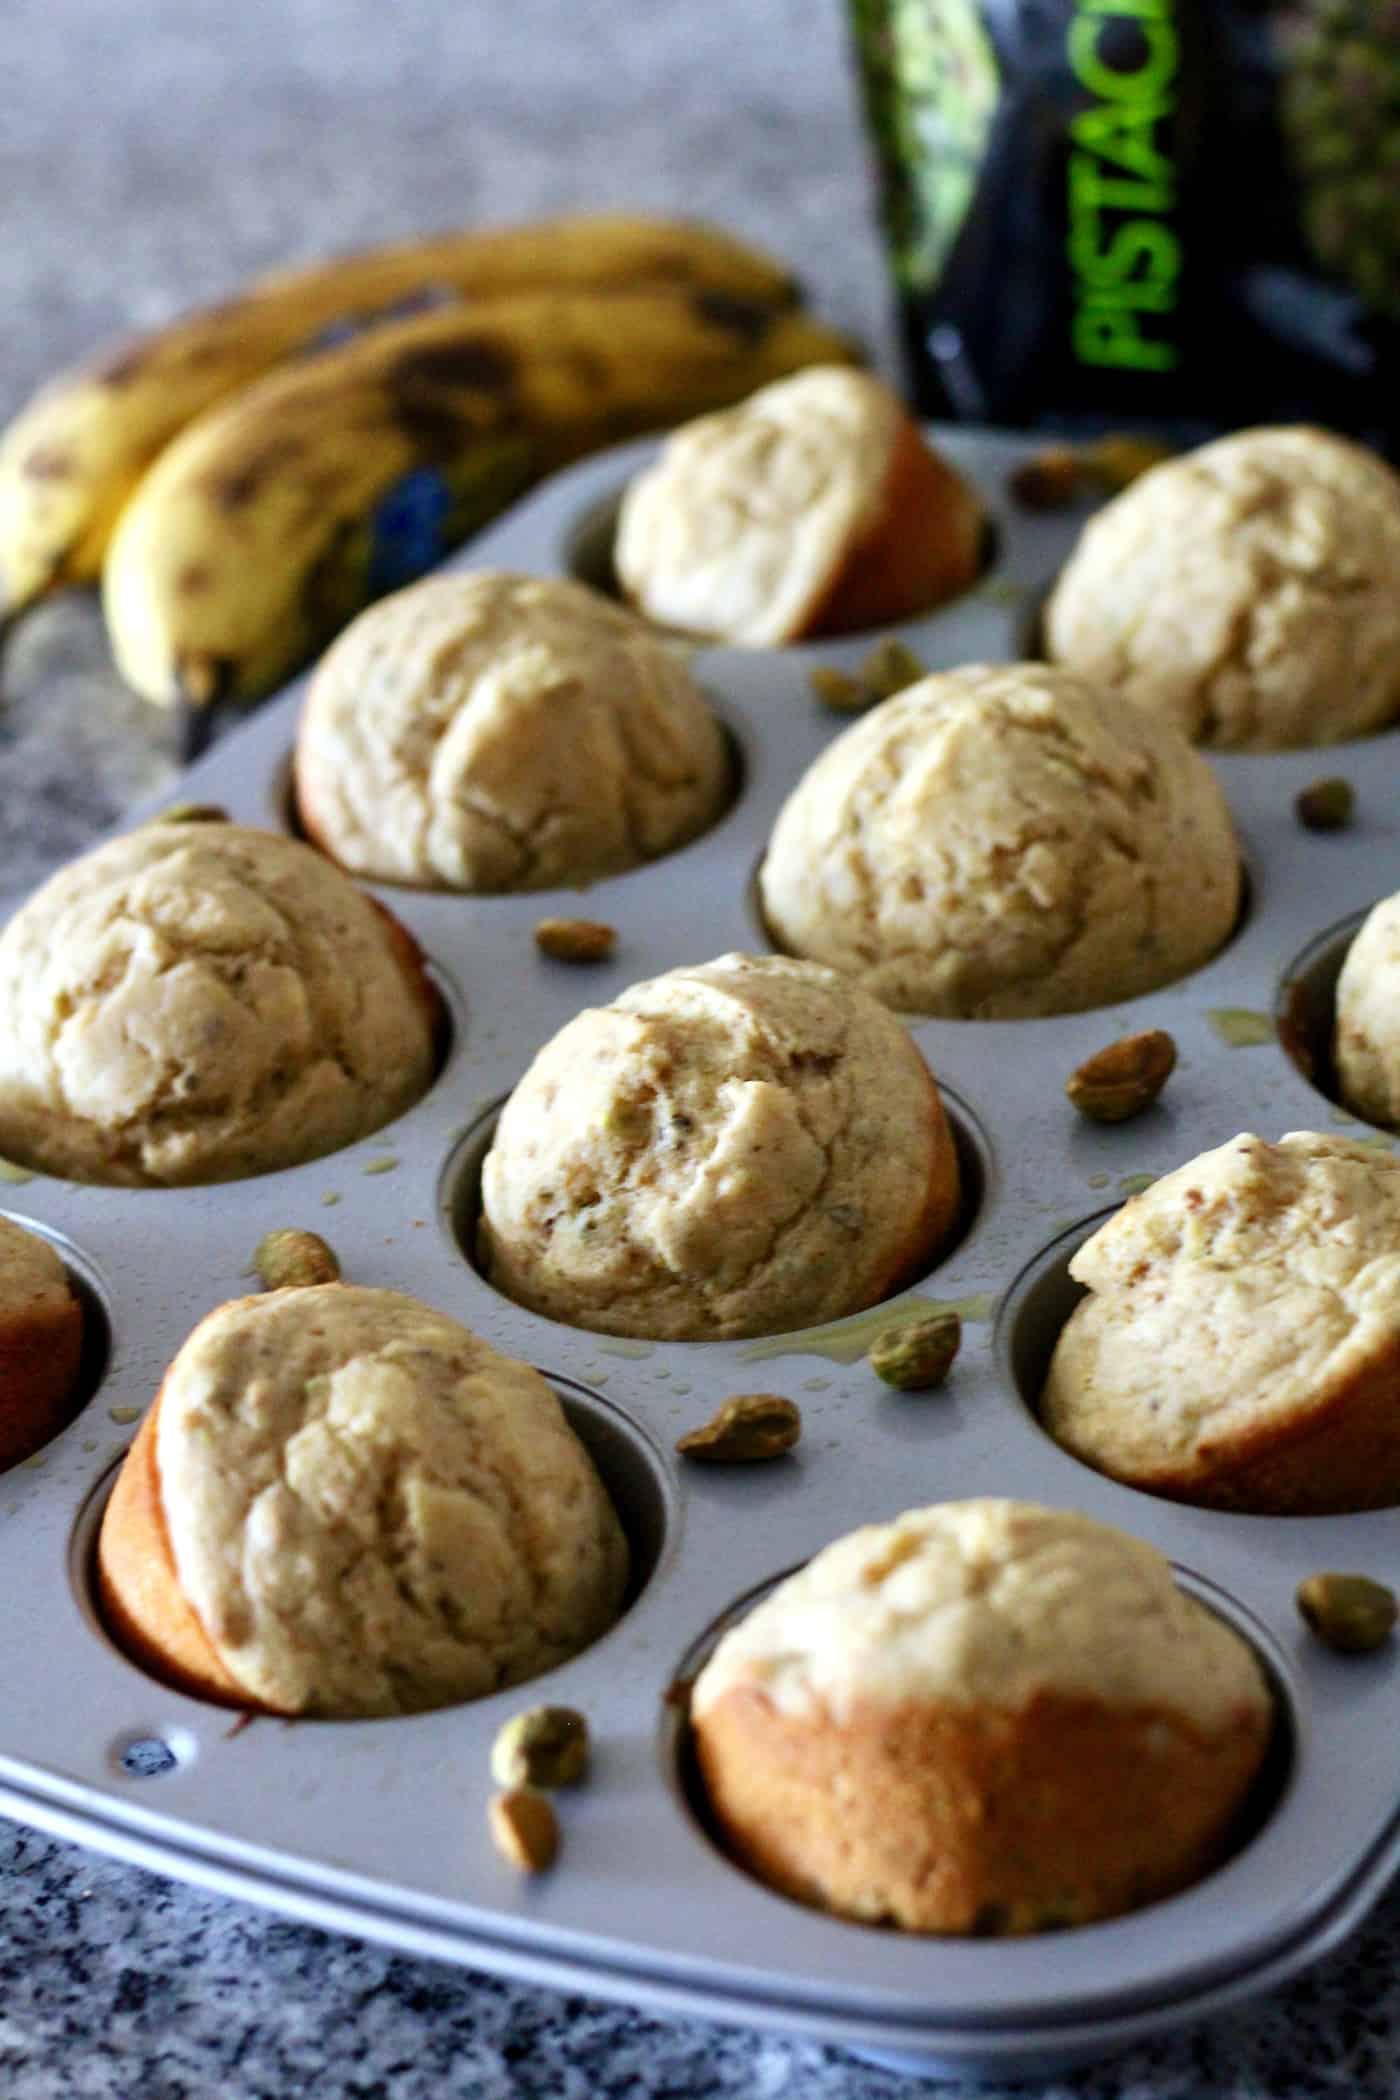 Whole Wheat Banana Pistachio Muffins